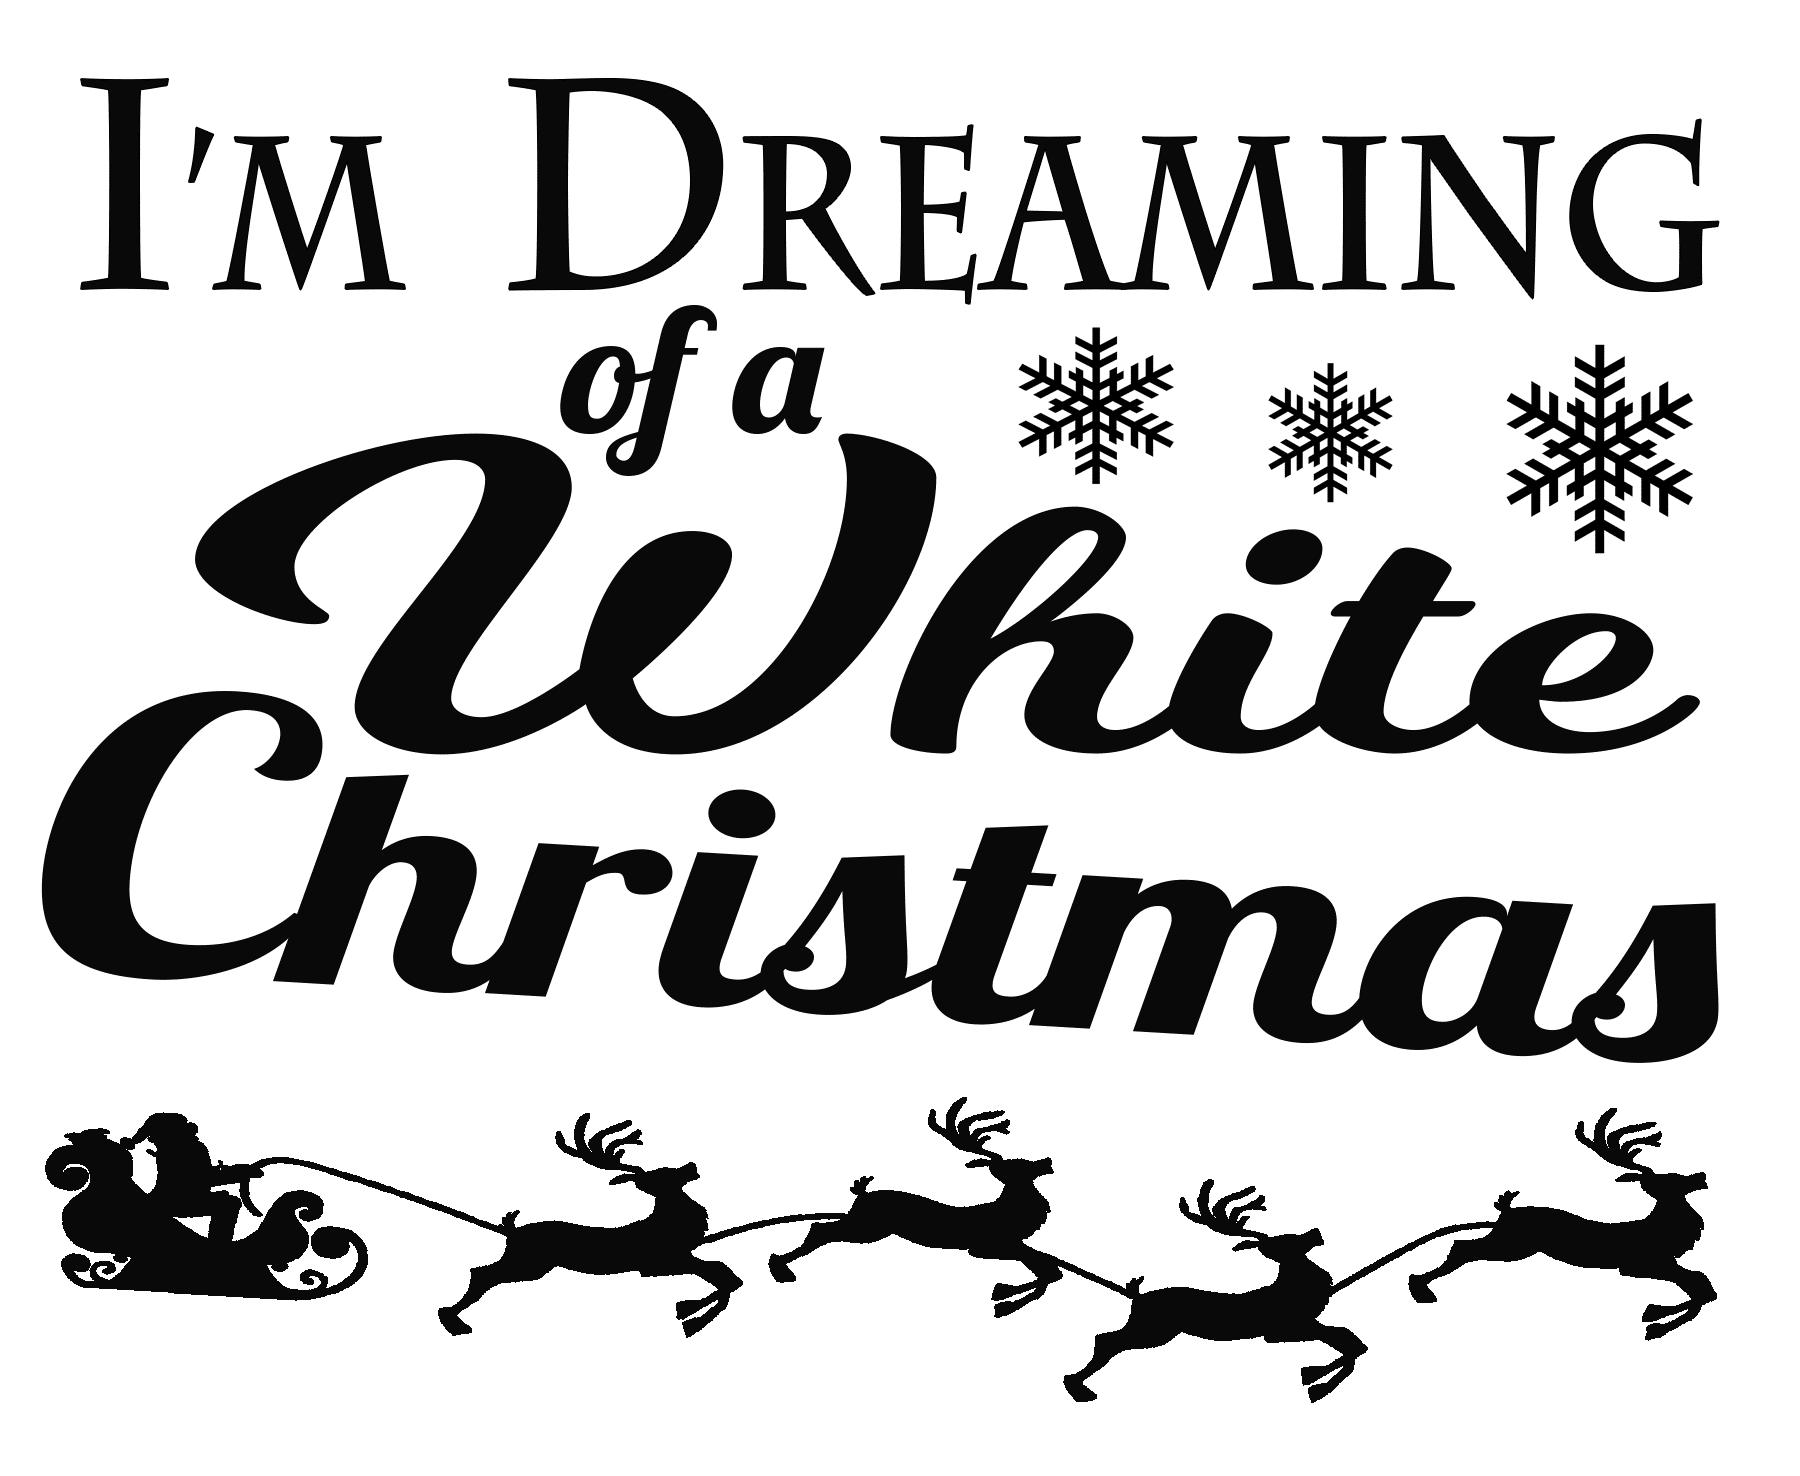 FREE White Christmas SVG File – Free SVG Files